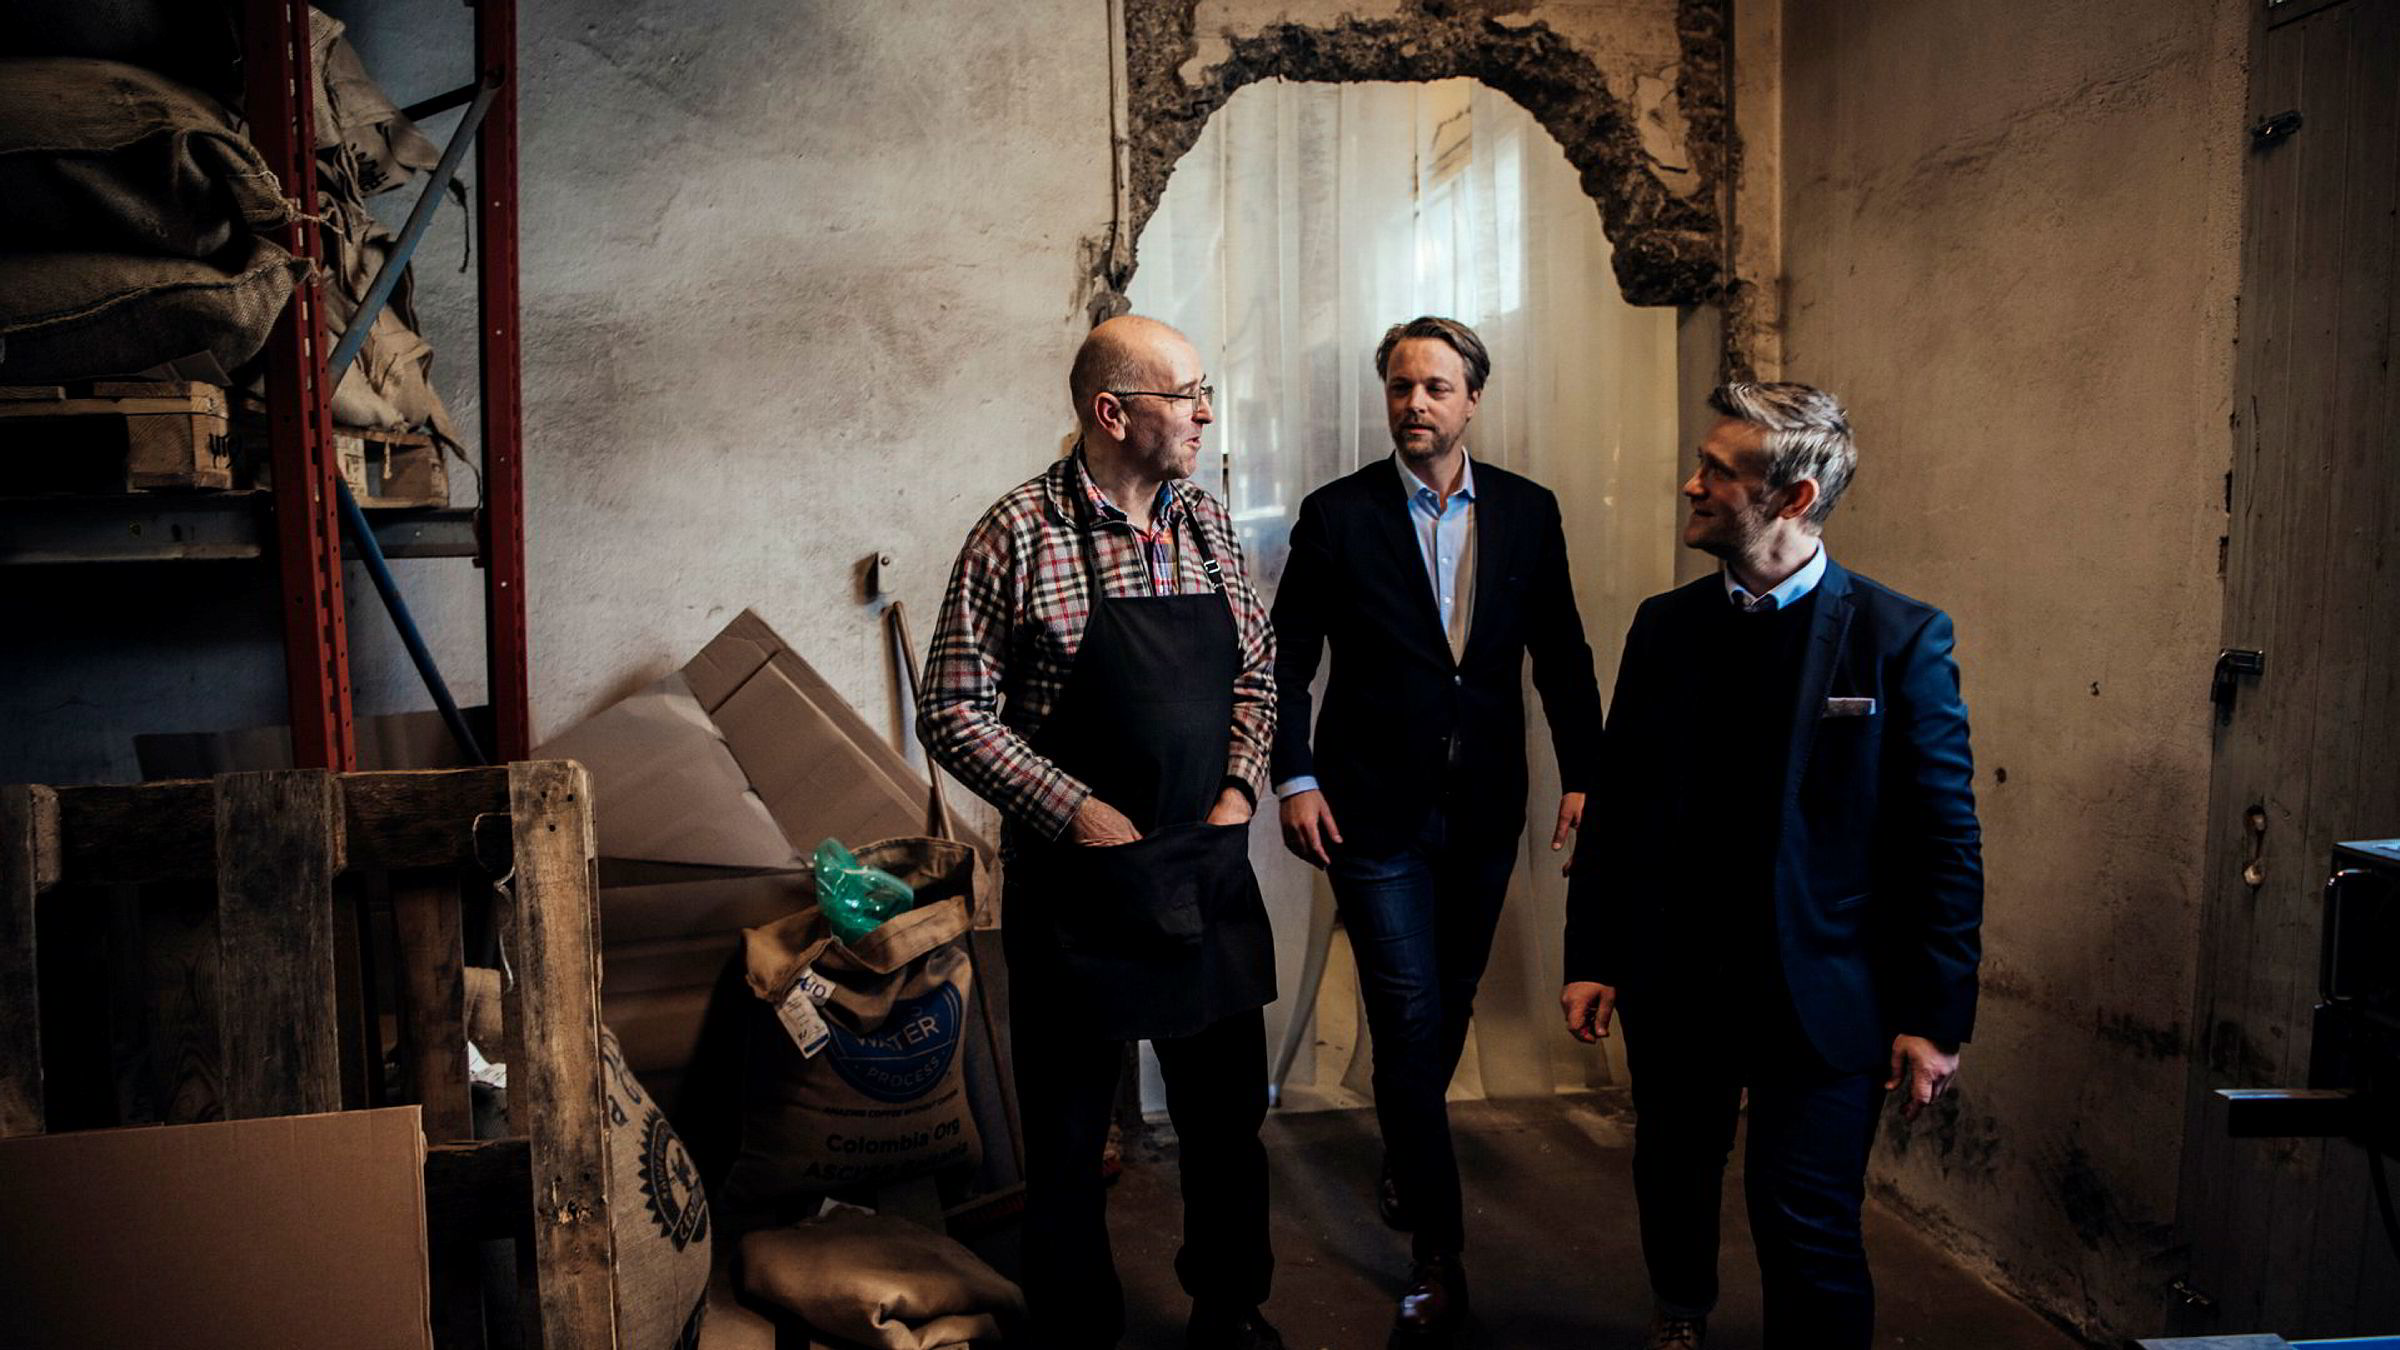 Sigurd Gramstad (til venstre) i Stavanger Kaffebrenneri snakker med David Baum (til høyre) og Jarle Holm i Vester AS om å finansiere en ny kaffebrenner til 1,8 millioner kroner.